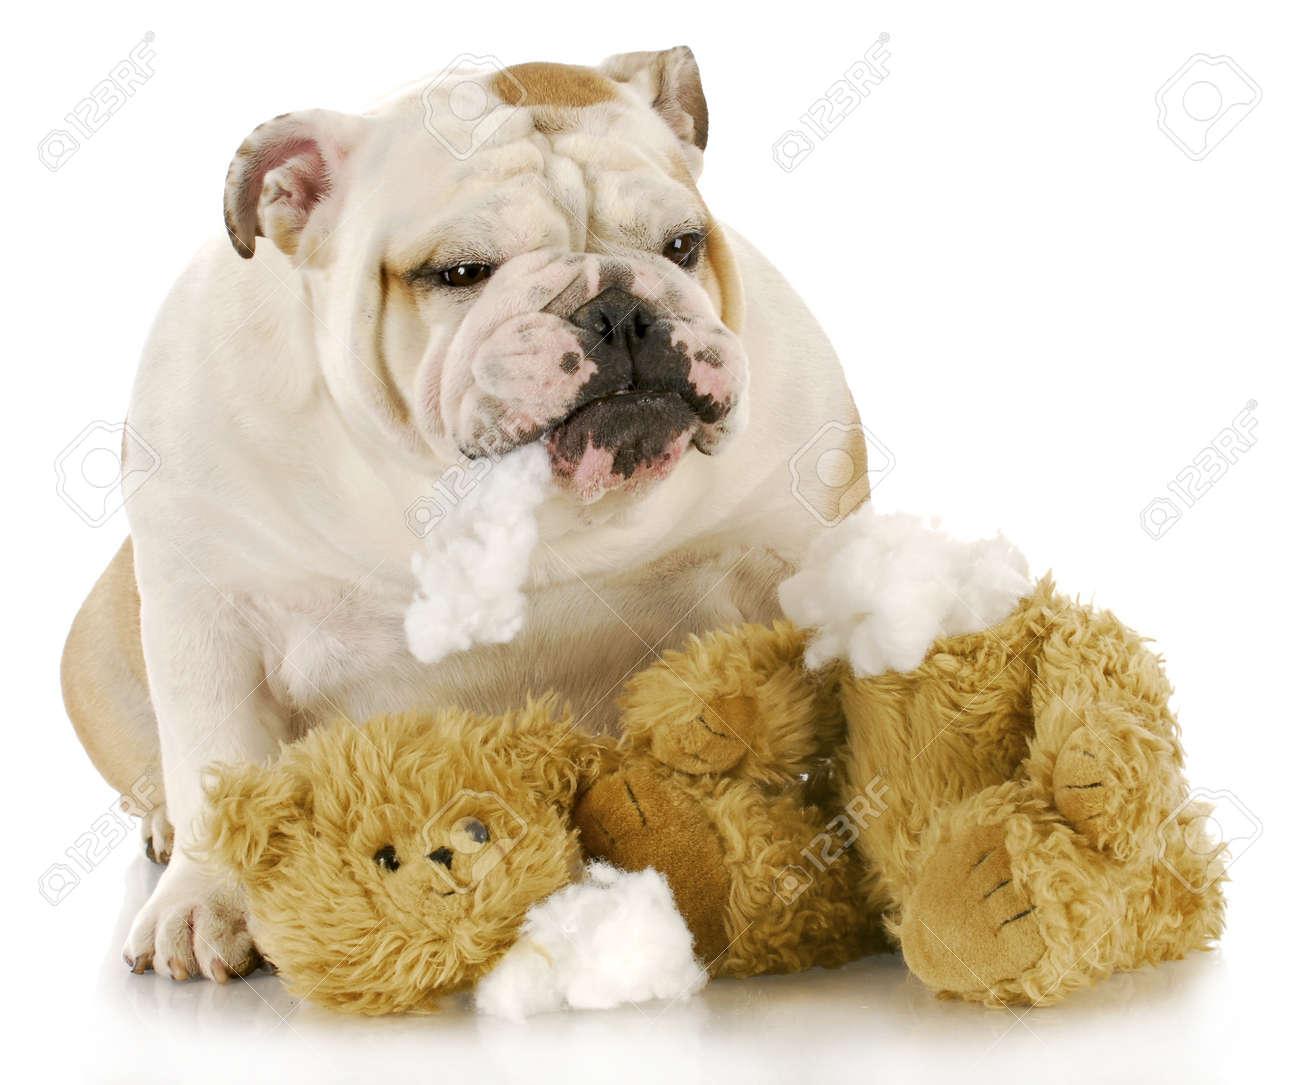 english bulldog ripping apart stuffed animal with reflection  - english bulldog ripping apart stuffed animal with reflection on whitebackground stock photo